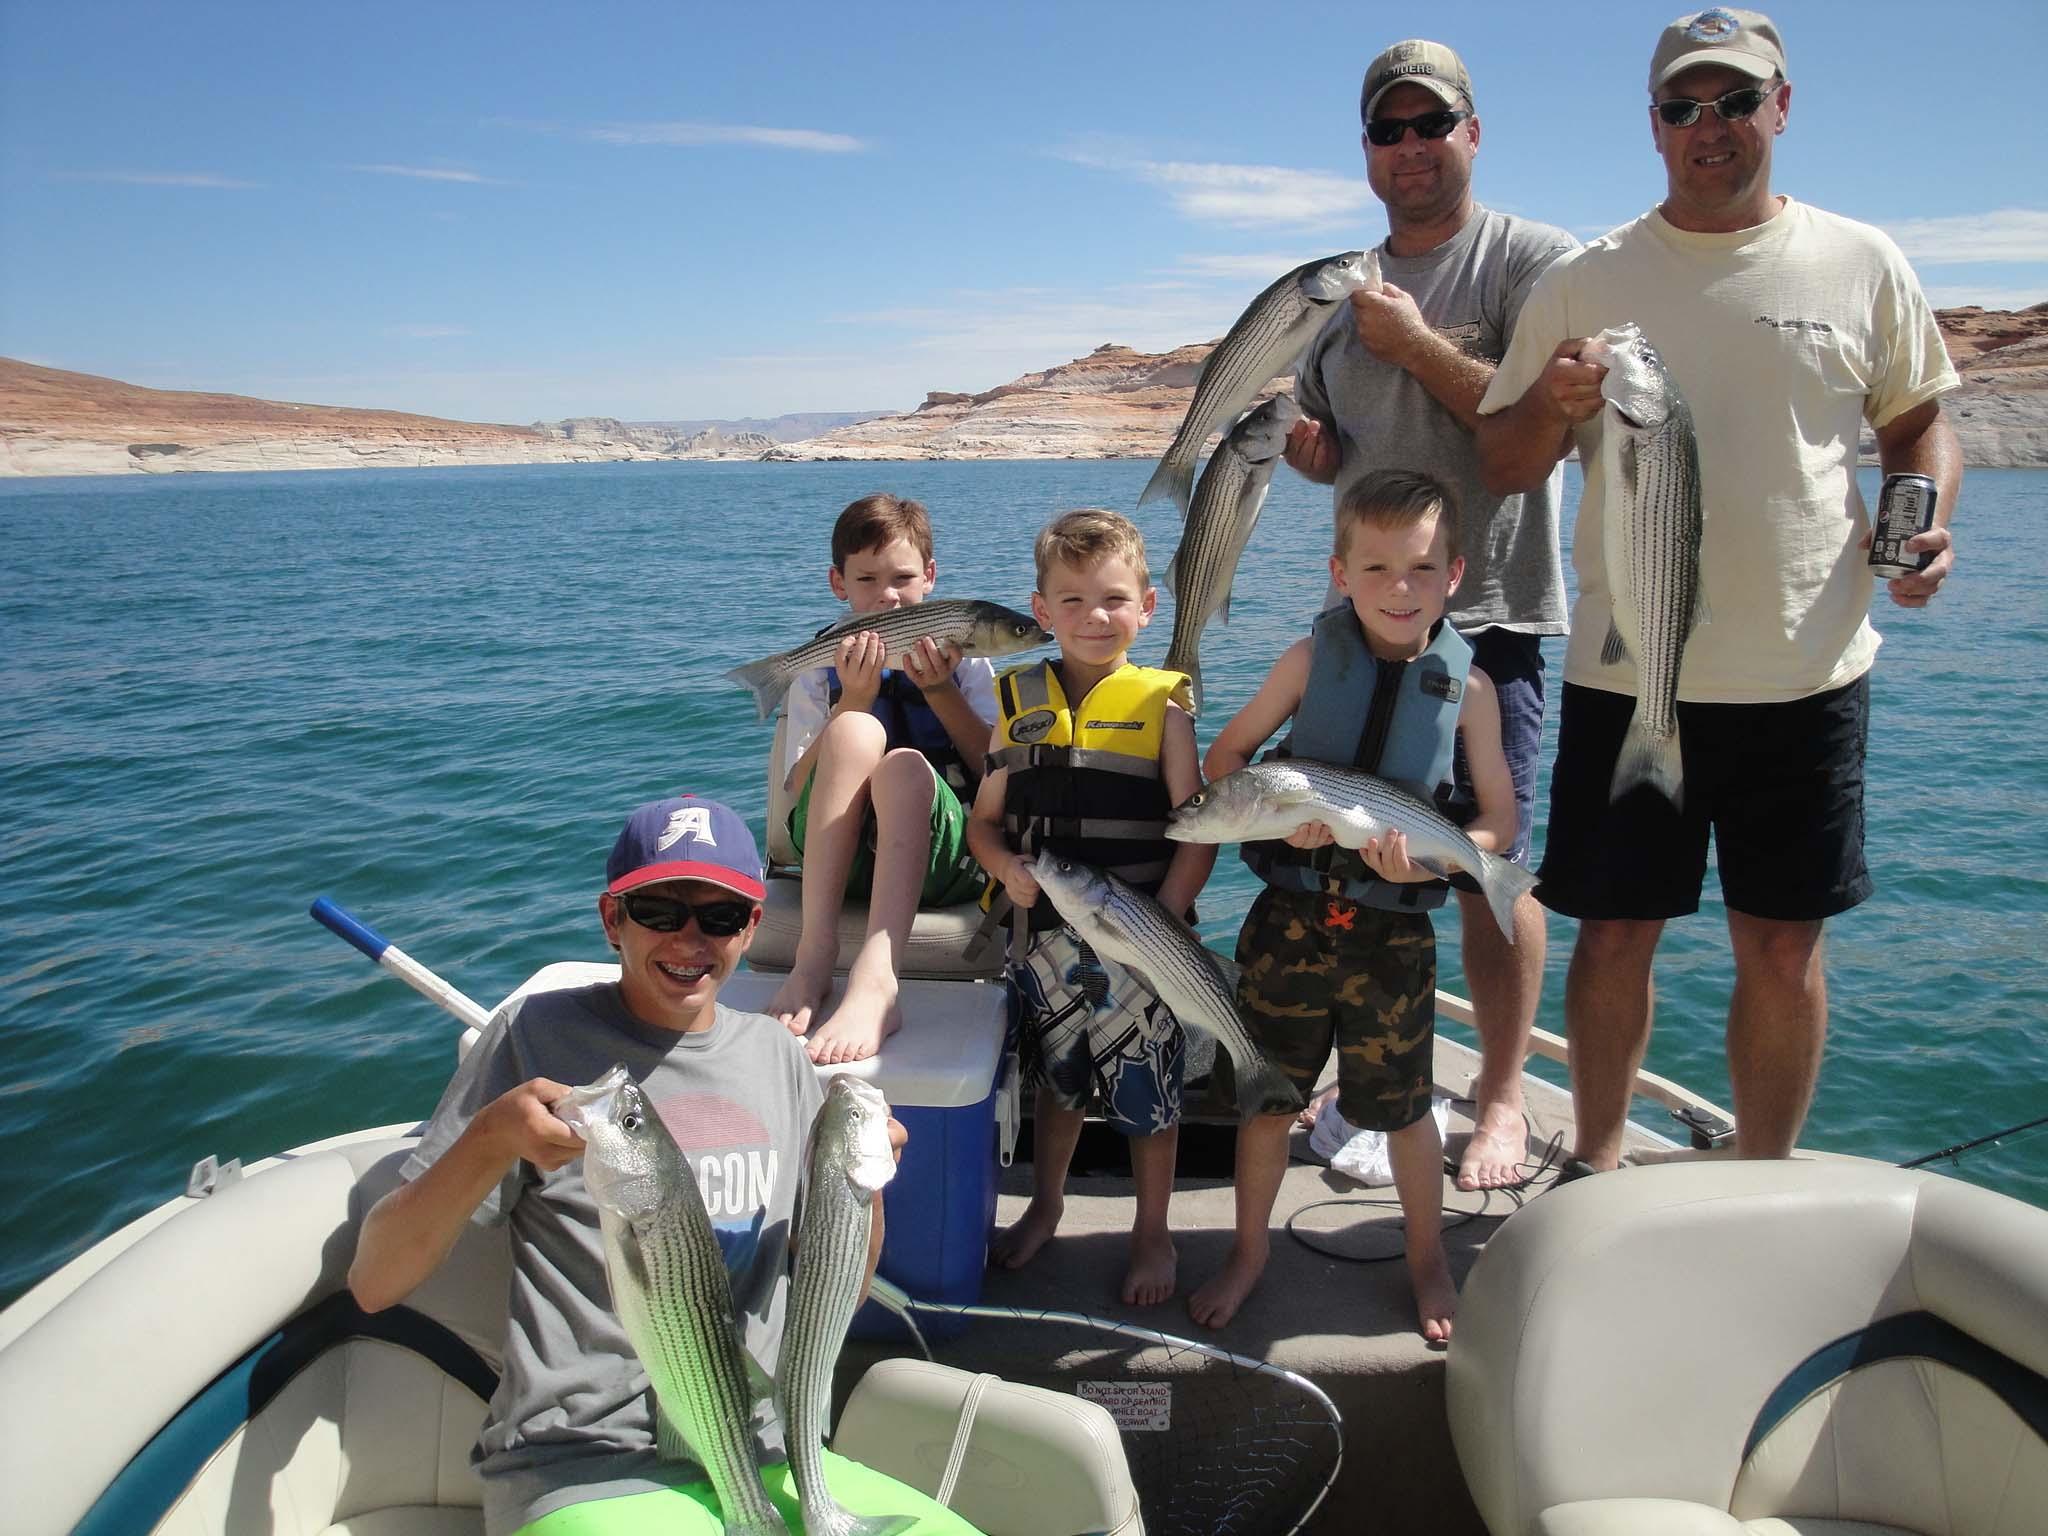 Lake powell fishing report by wayne gustavson 7 23 13 for Lake powell fishing